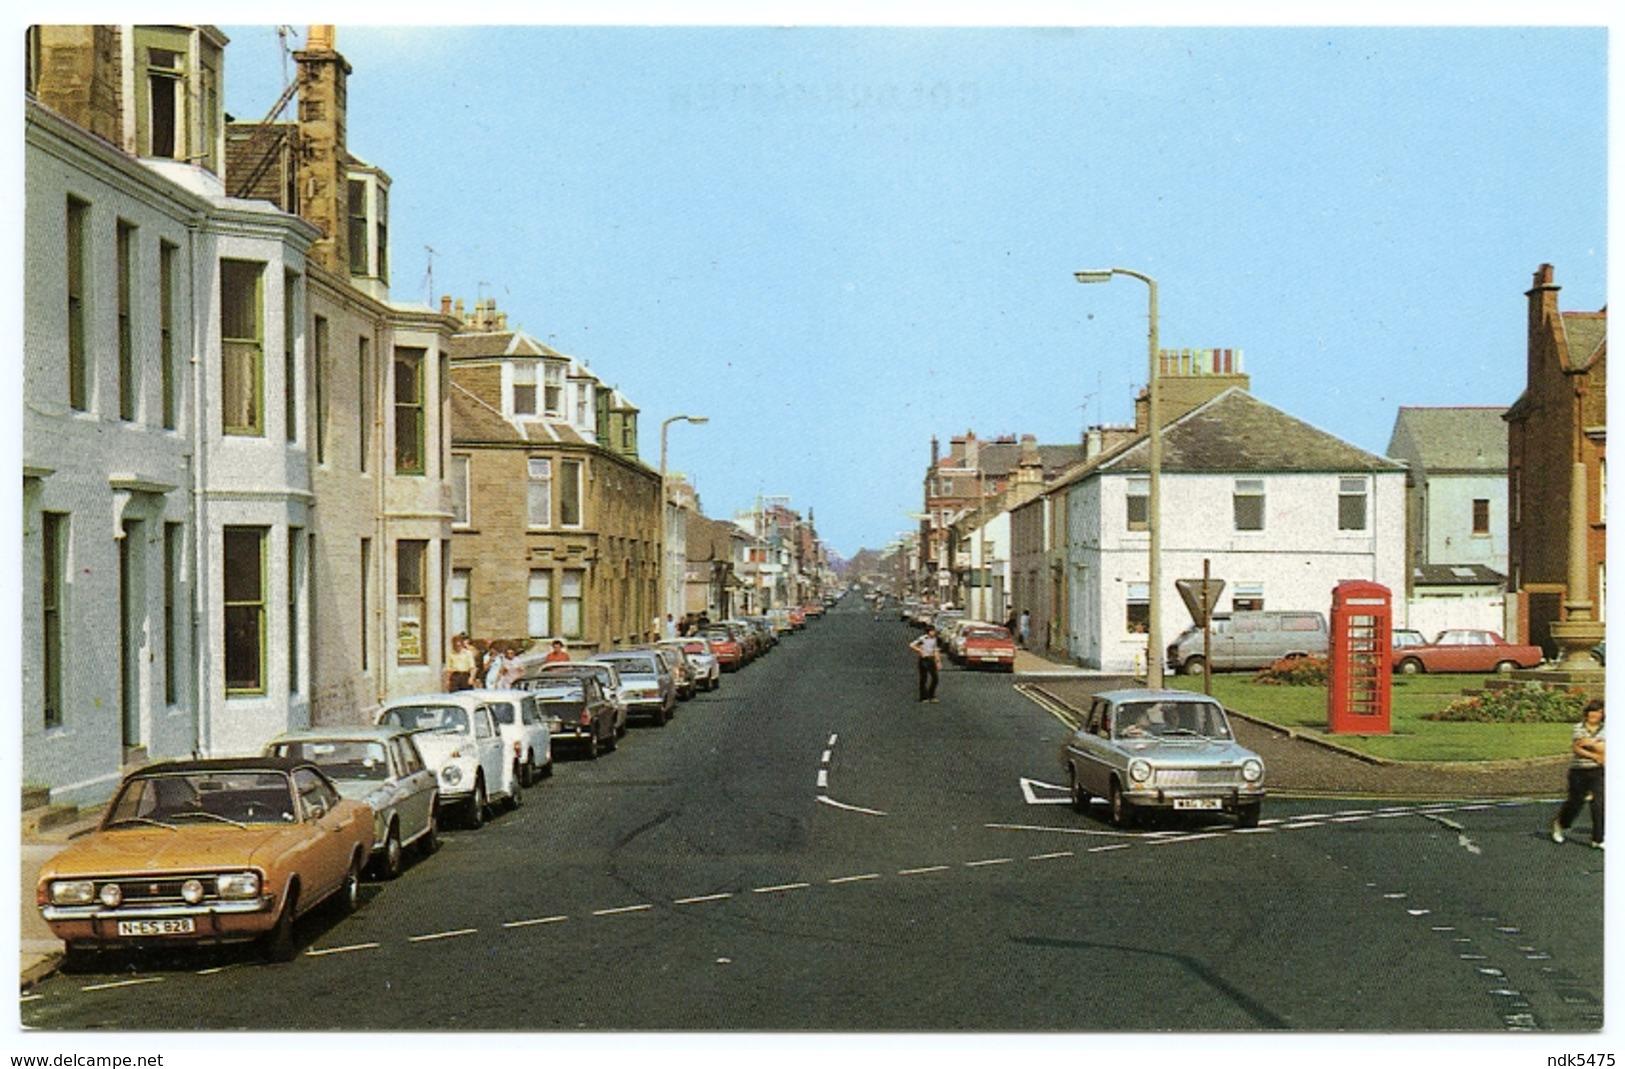 TROON : PORTLAND STREET - Ayrshire